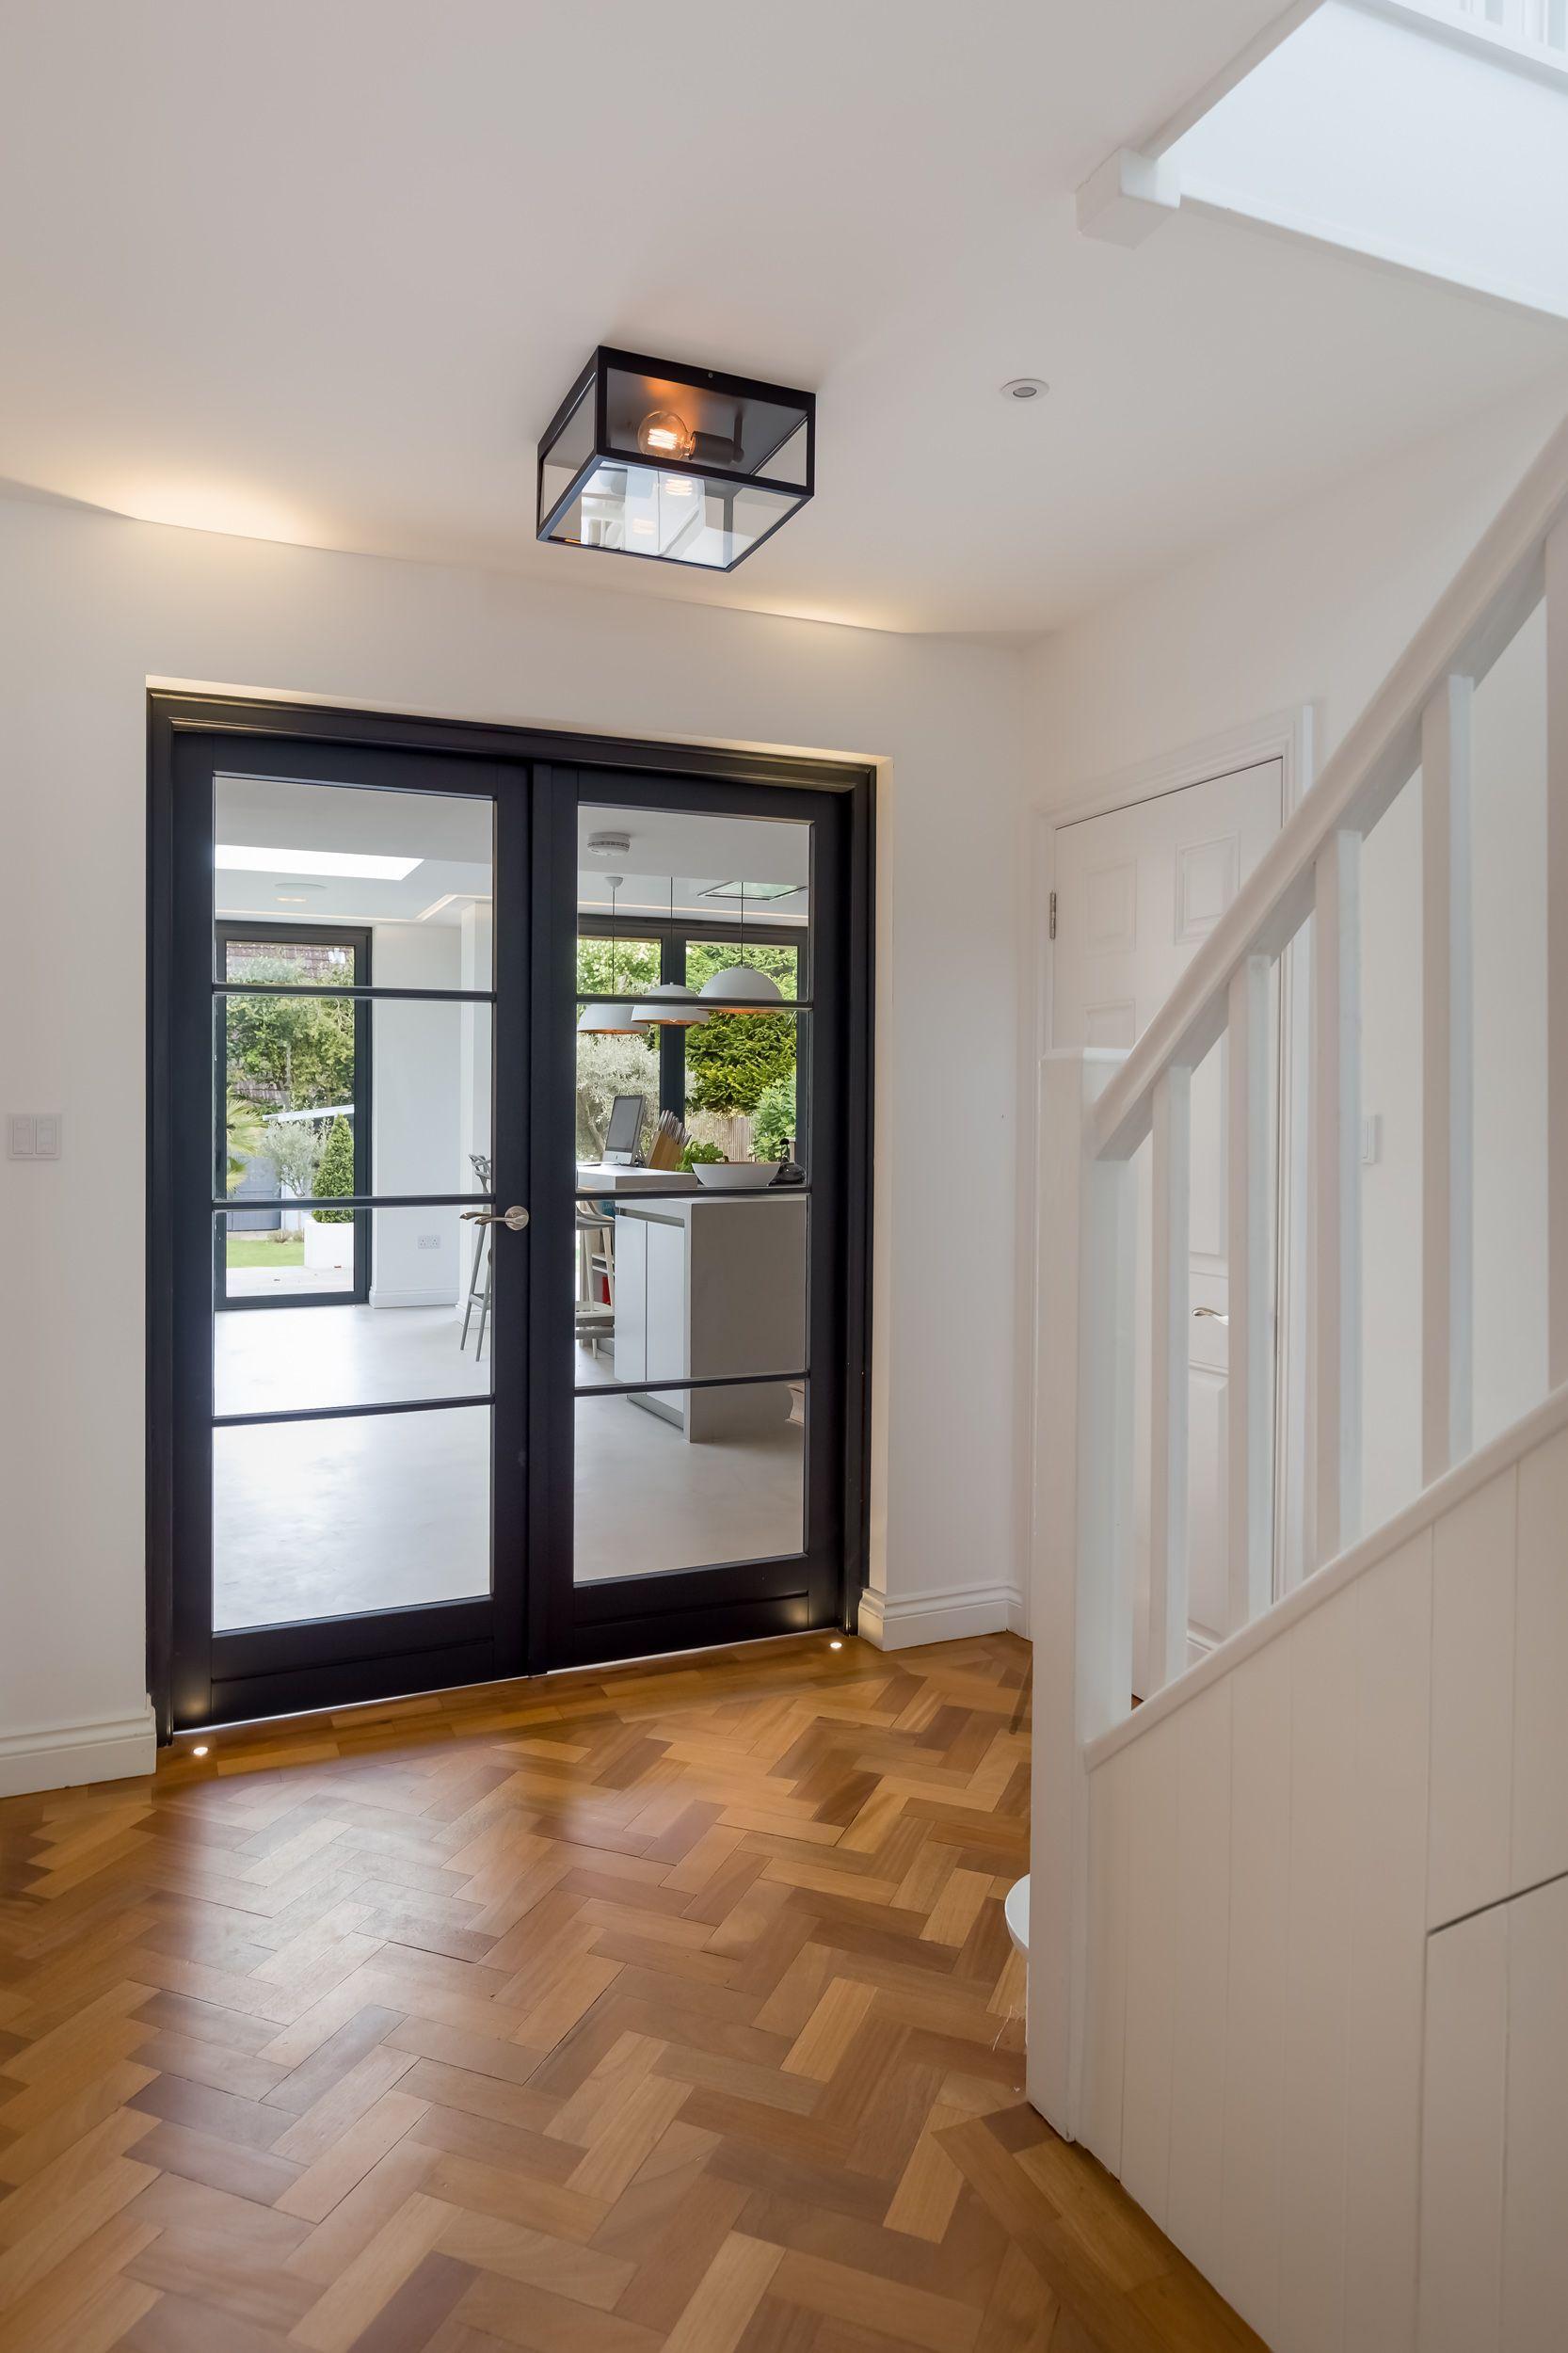 Hallway - Ground Floor Entrance - Stairs - Industrial Doors